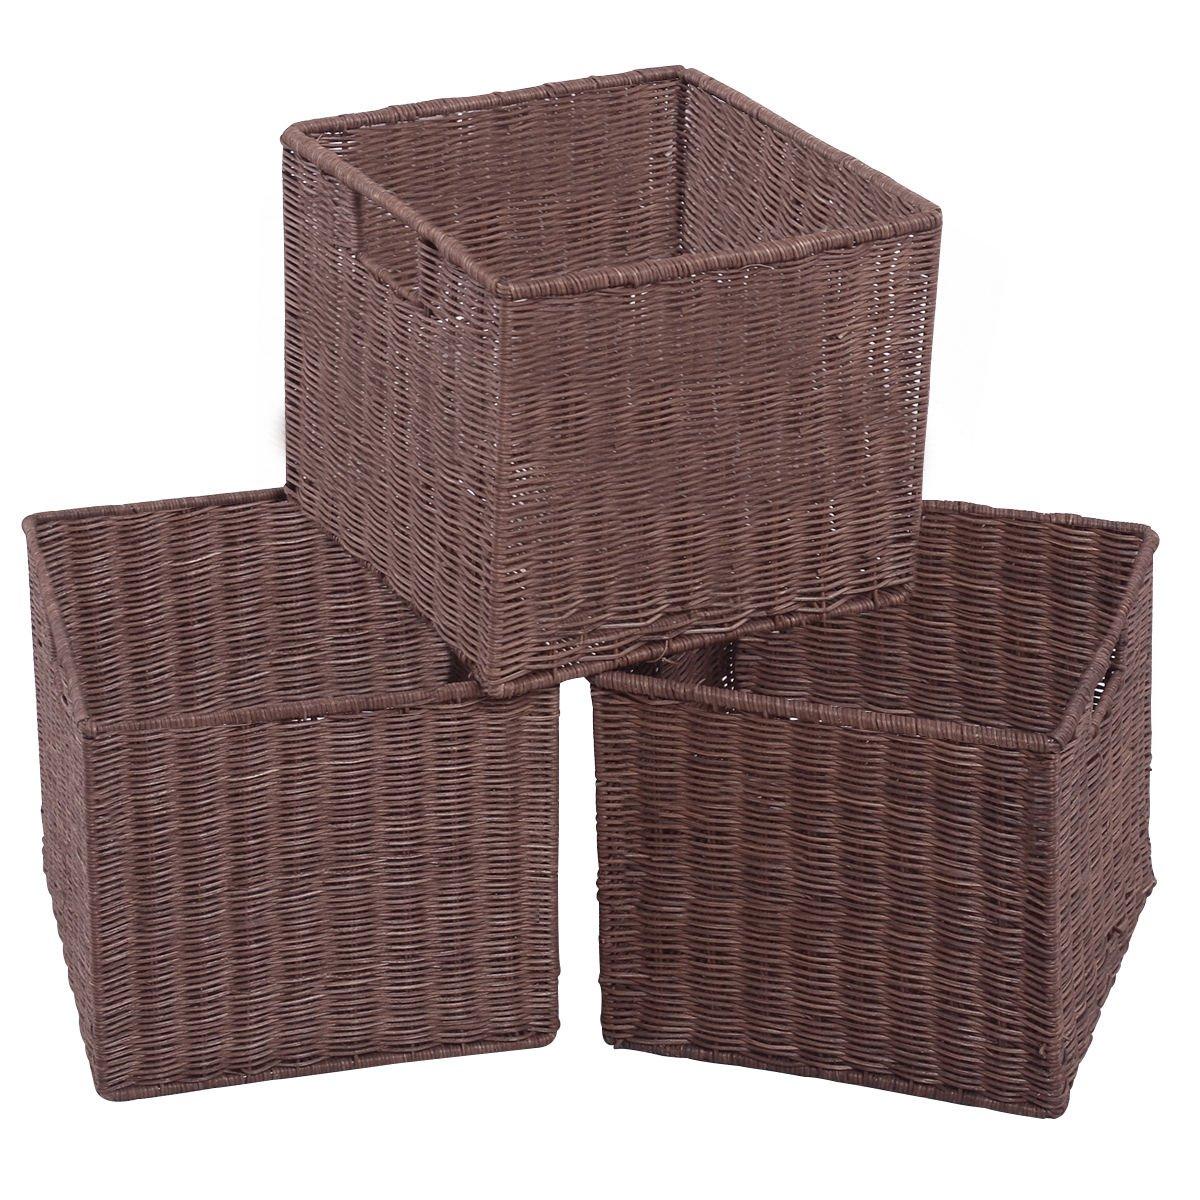 Set of 3 Wicker Cube Rattan Storage Nest Baskets Bin Box Organizer